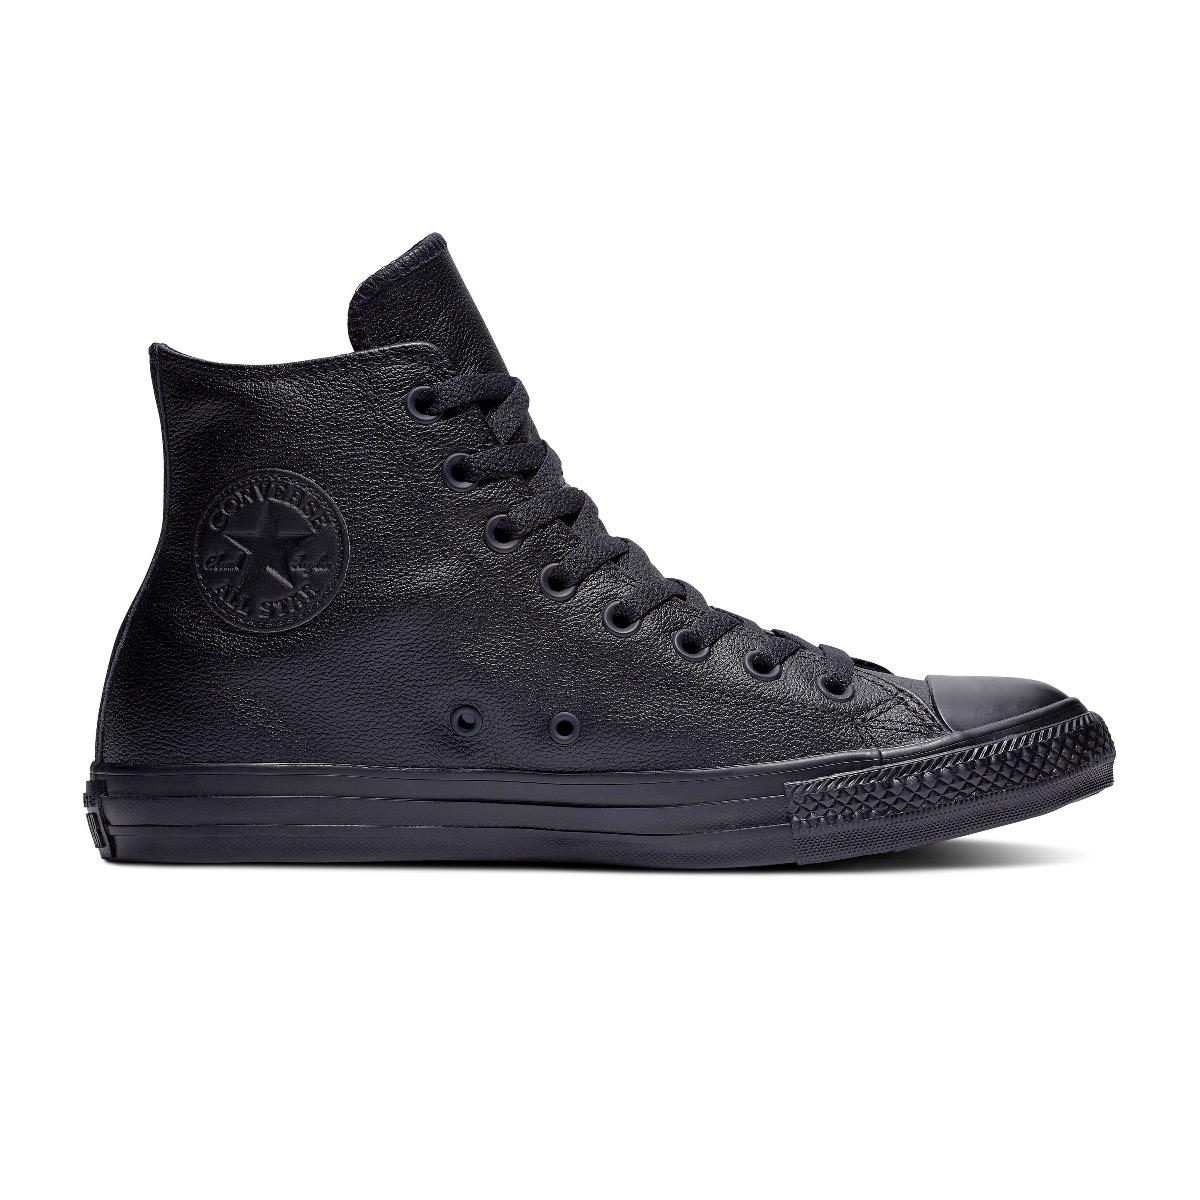 Converse All Stars Leather Hoog 135251C Zwart-41 maat 41